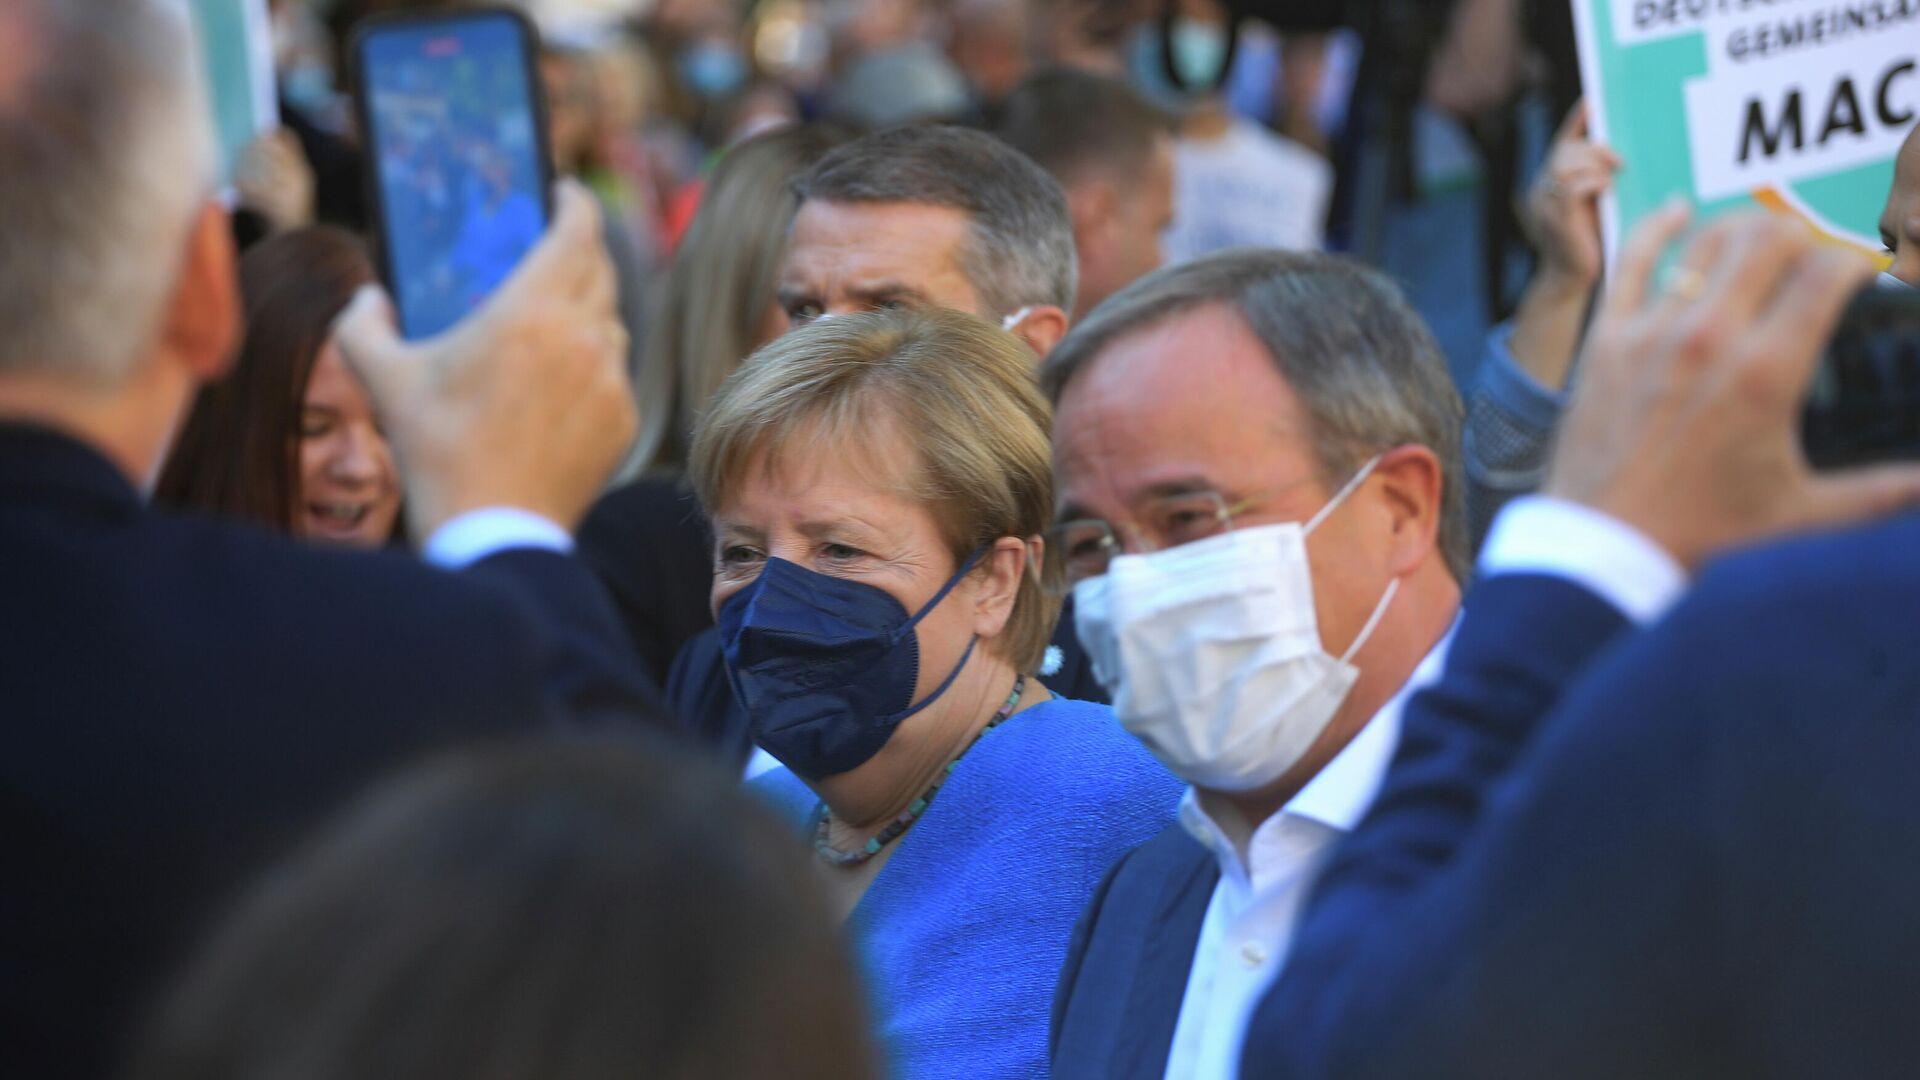 Merkel macht in Aachen Wahlkampf mit Laschet am 25. September 2021 - SNA, 1920, 25.09.2021